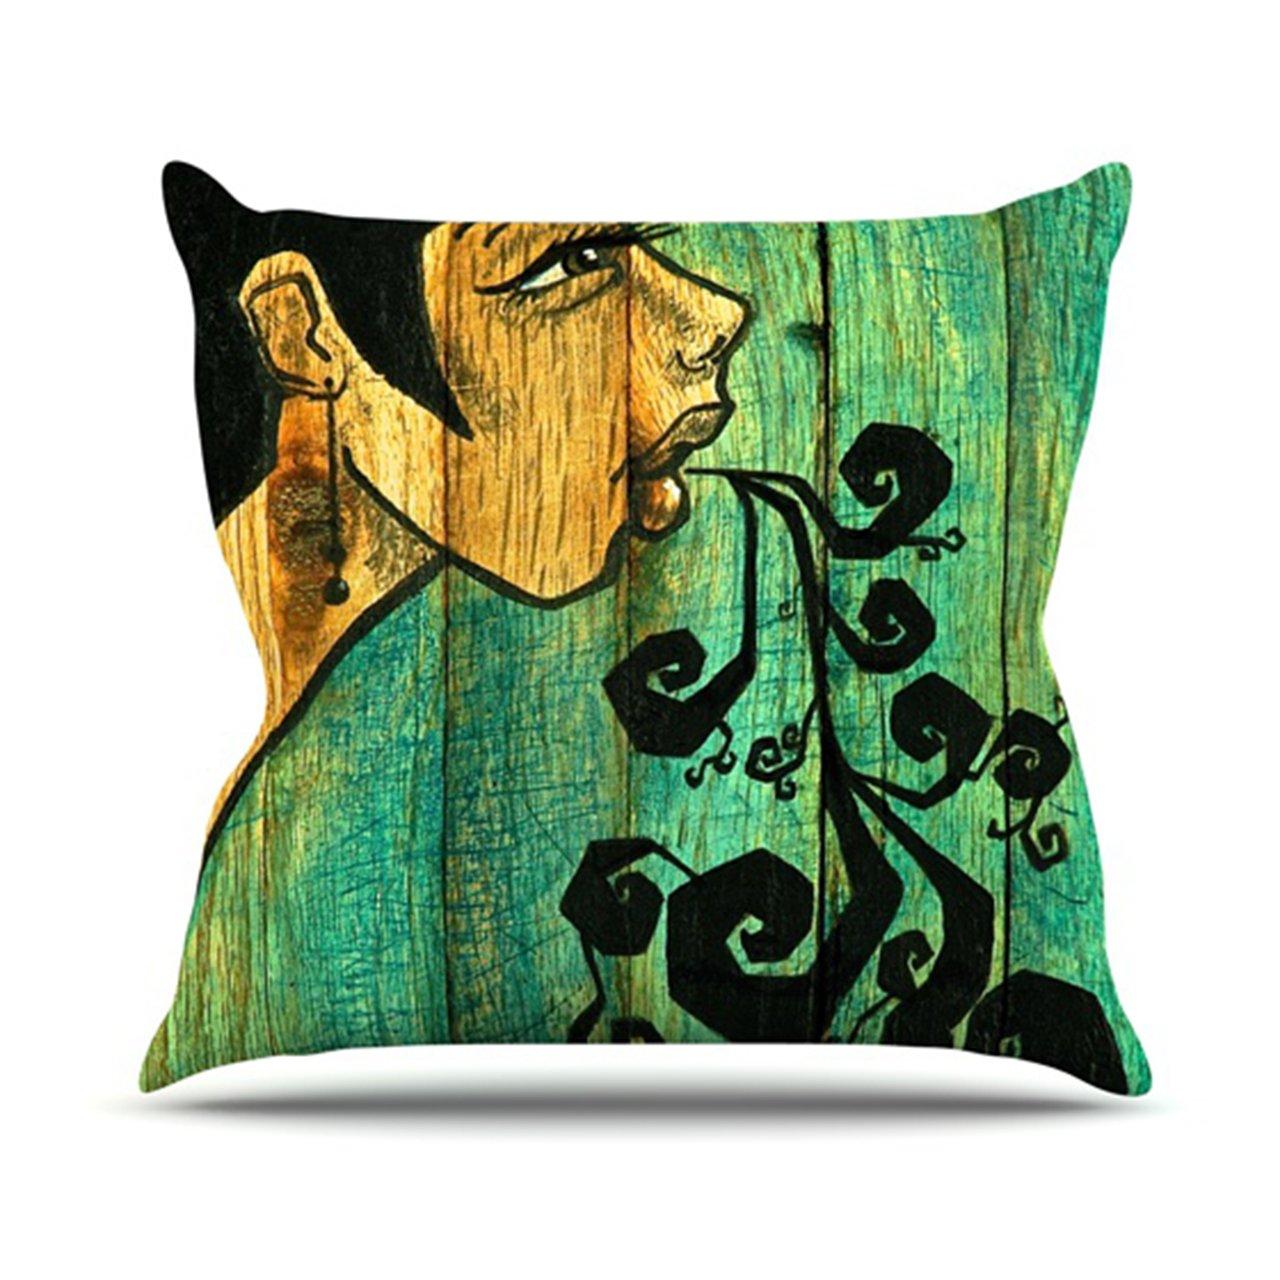 16 by 16-Inch Kess InHouse Jaidyn Erickson Breathe Throw Pillow